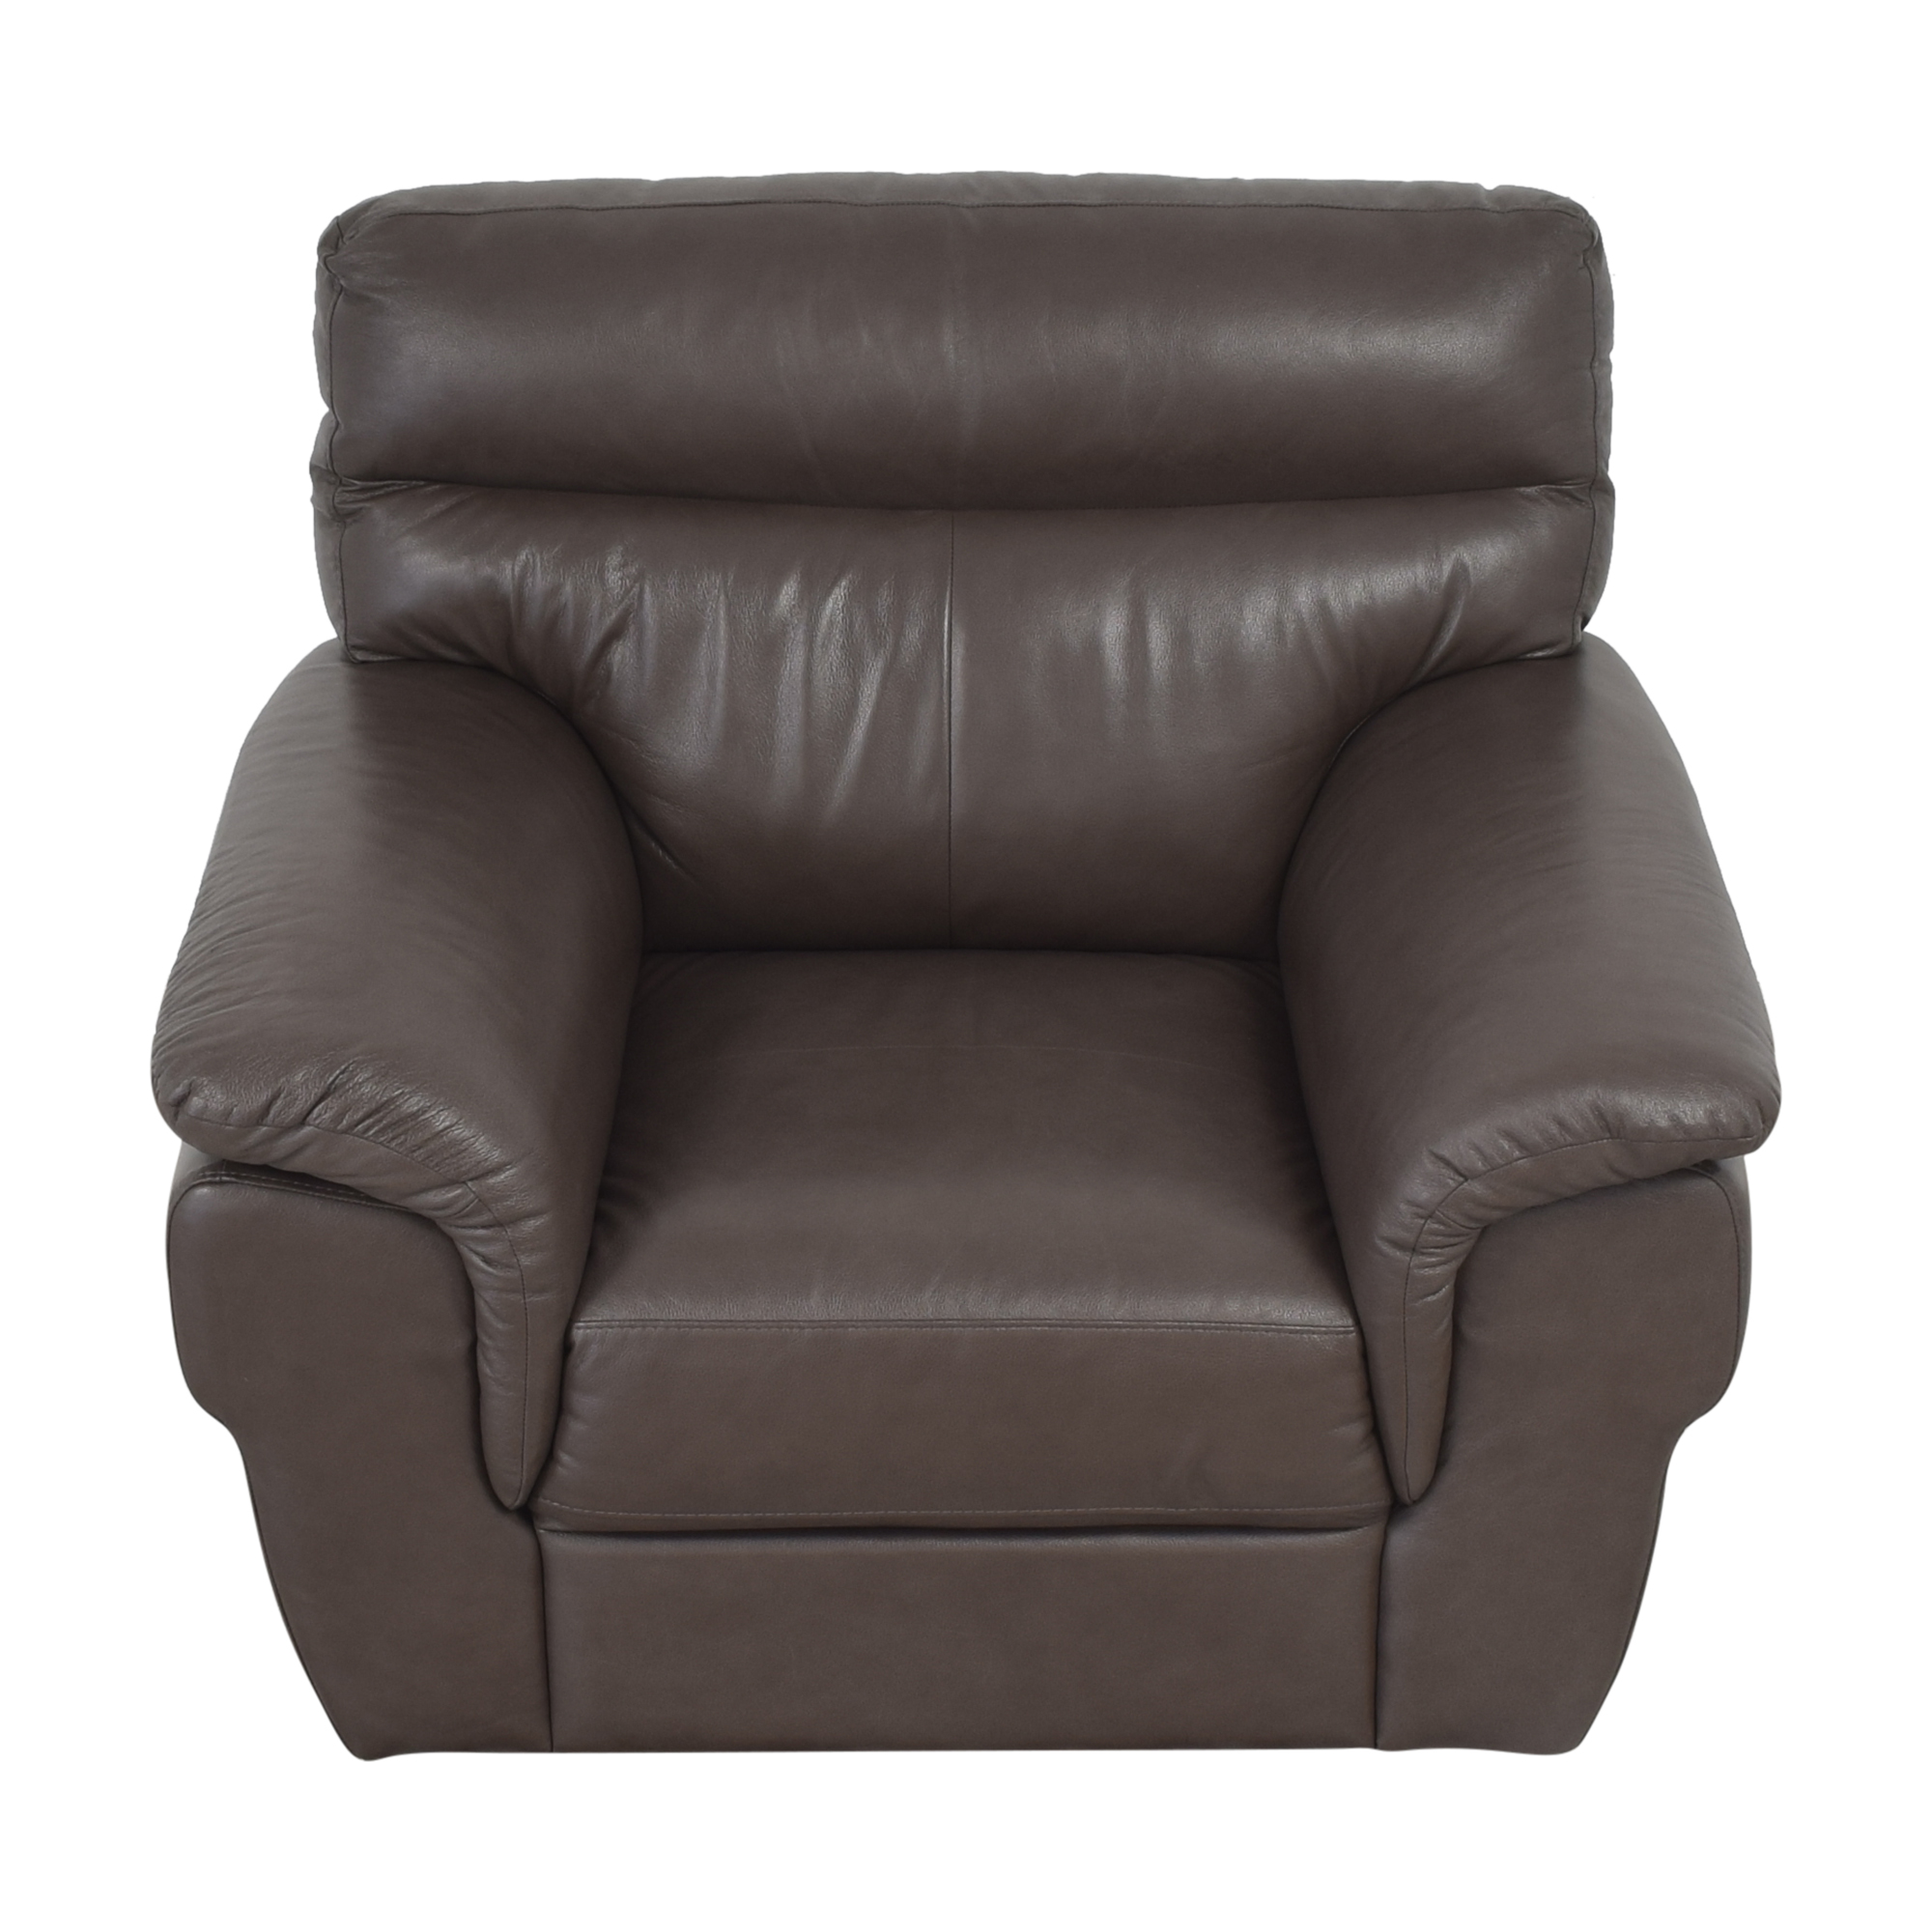 Raymour & Flanigan Raymour & Flanigan Luca Chair nyc